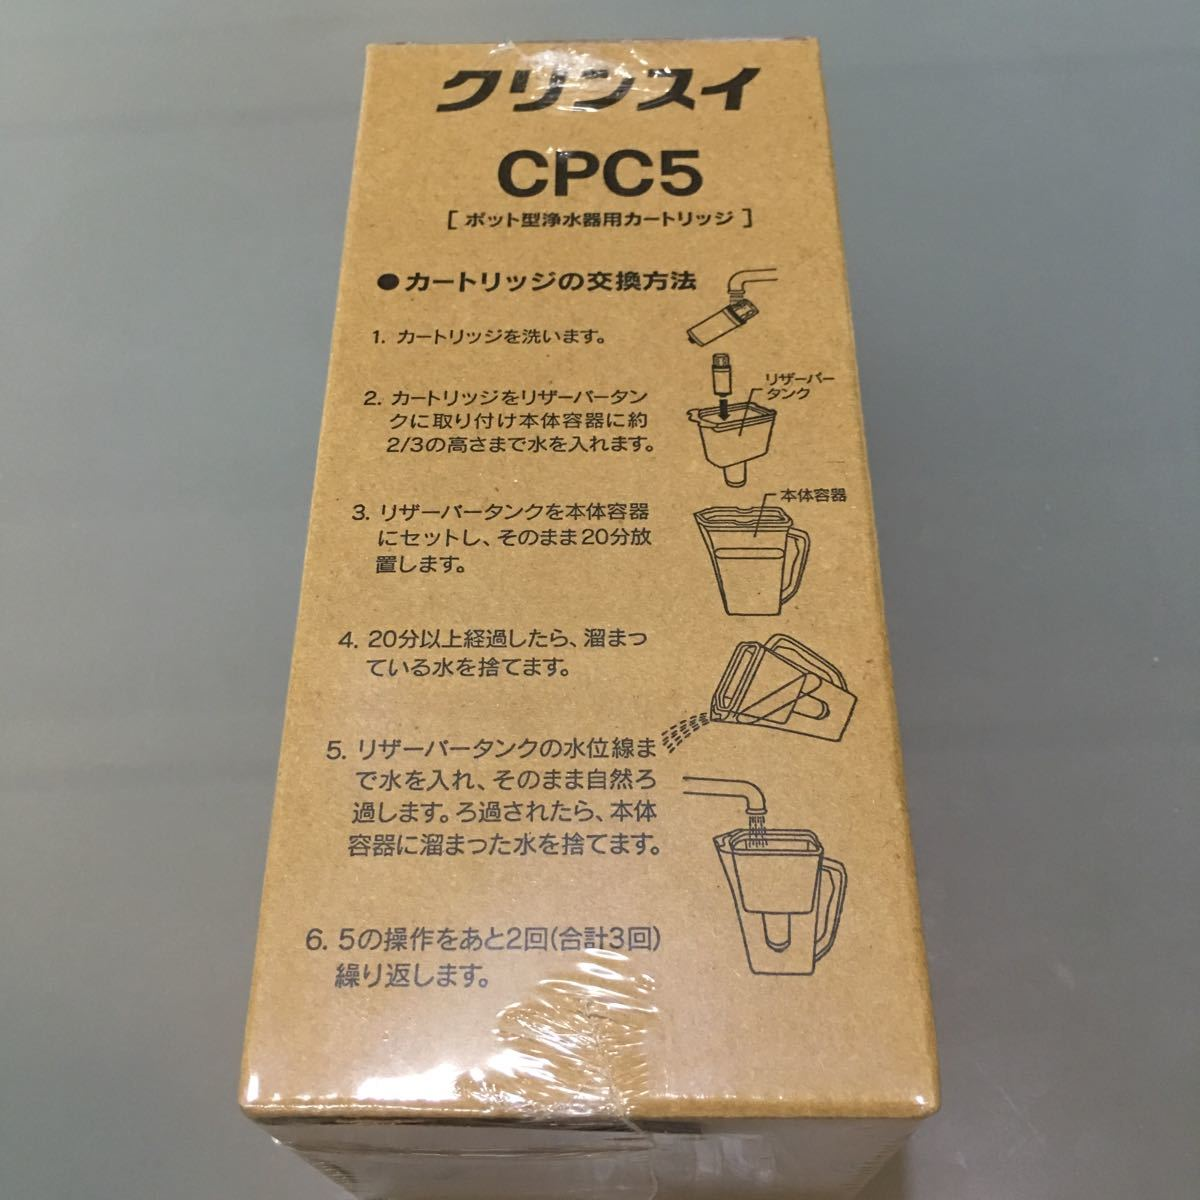 Cleansui ポット型浄水器用カートリッジ CPC5 クリンスイ 新品未使用_画像2